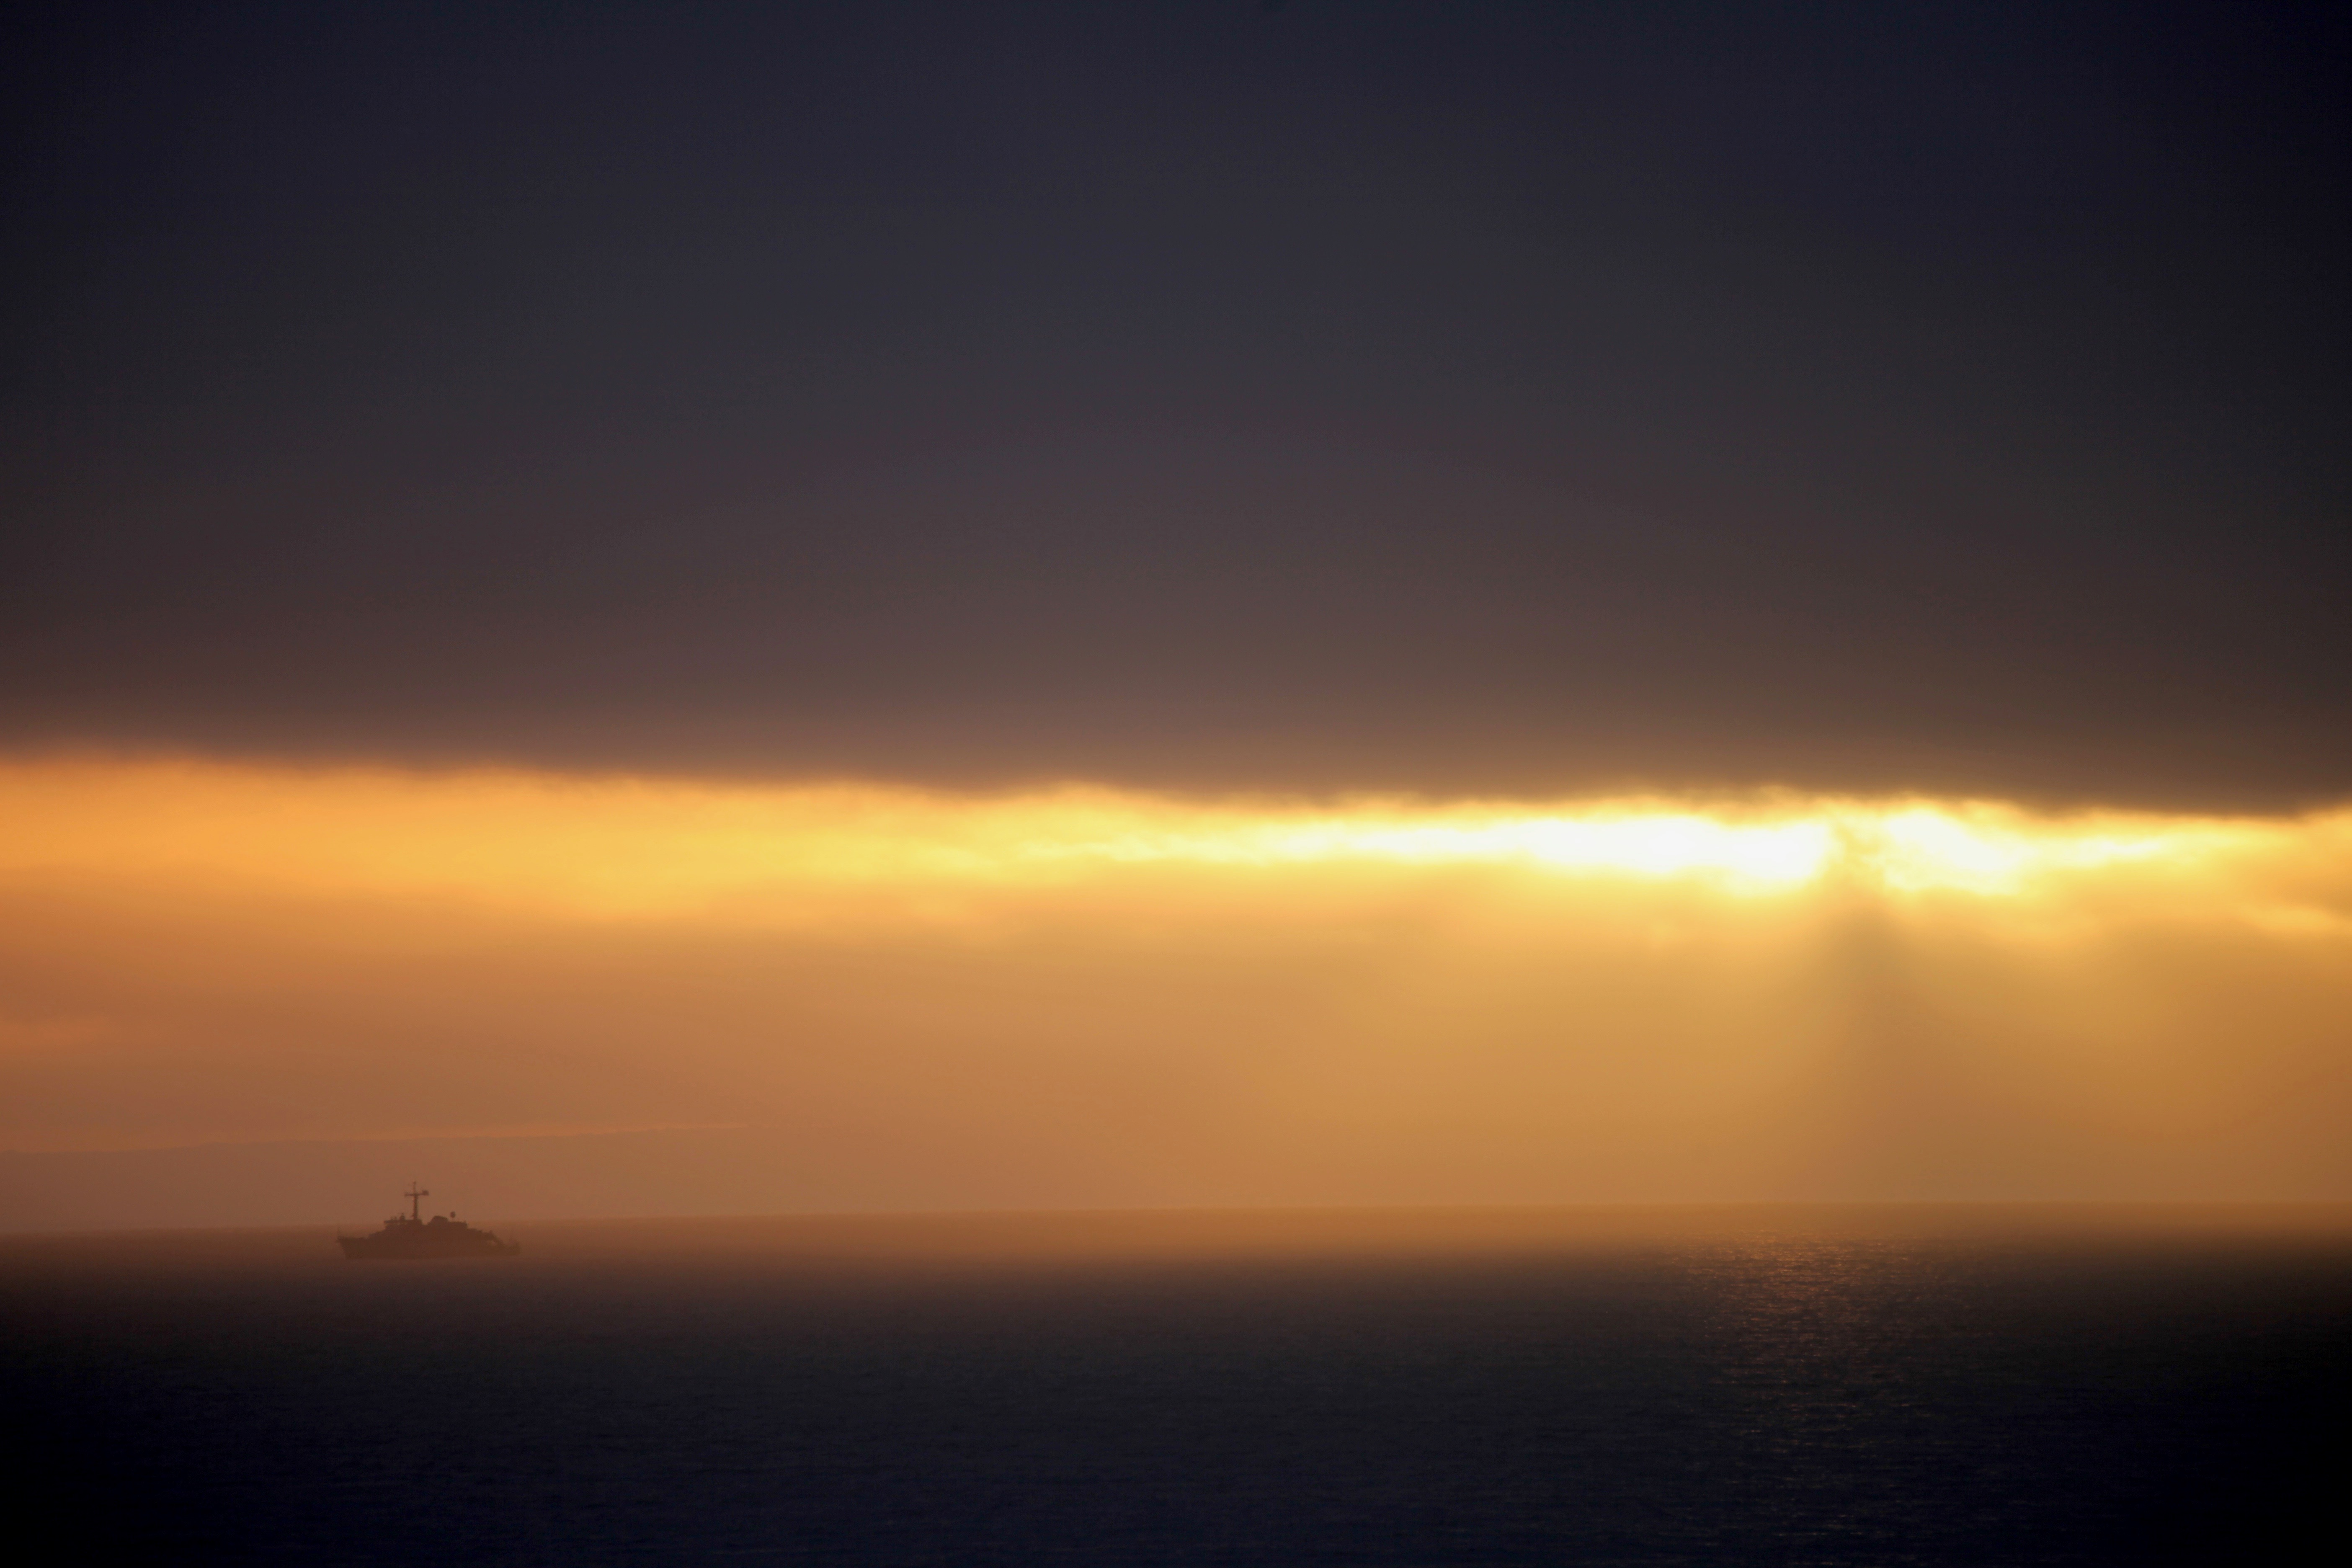 Ship in sunset 4